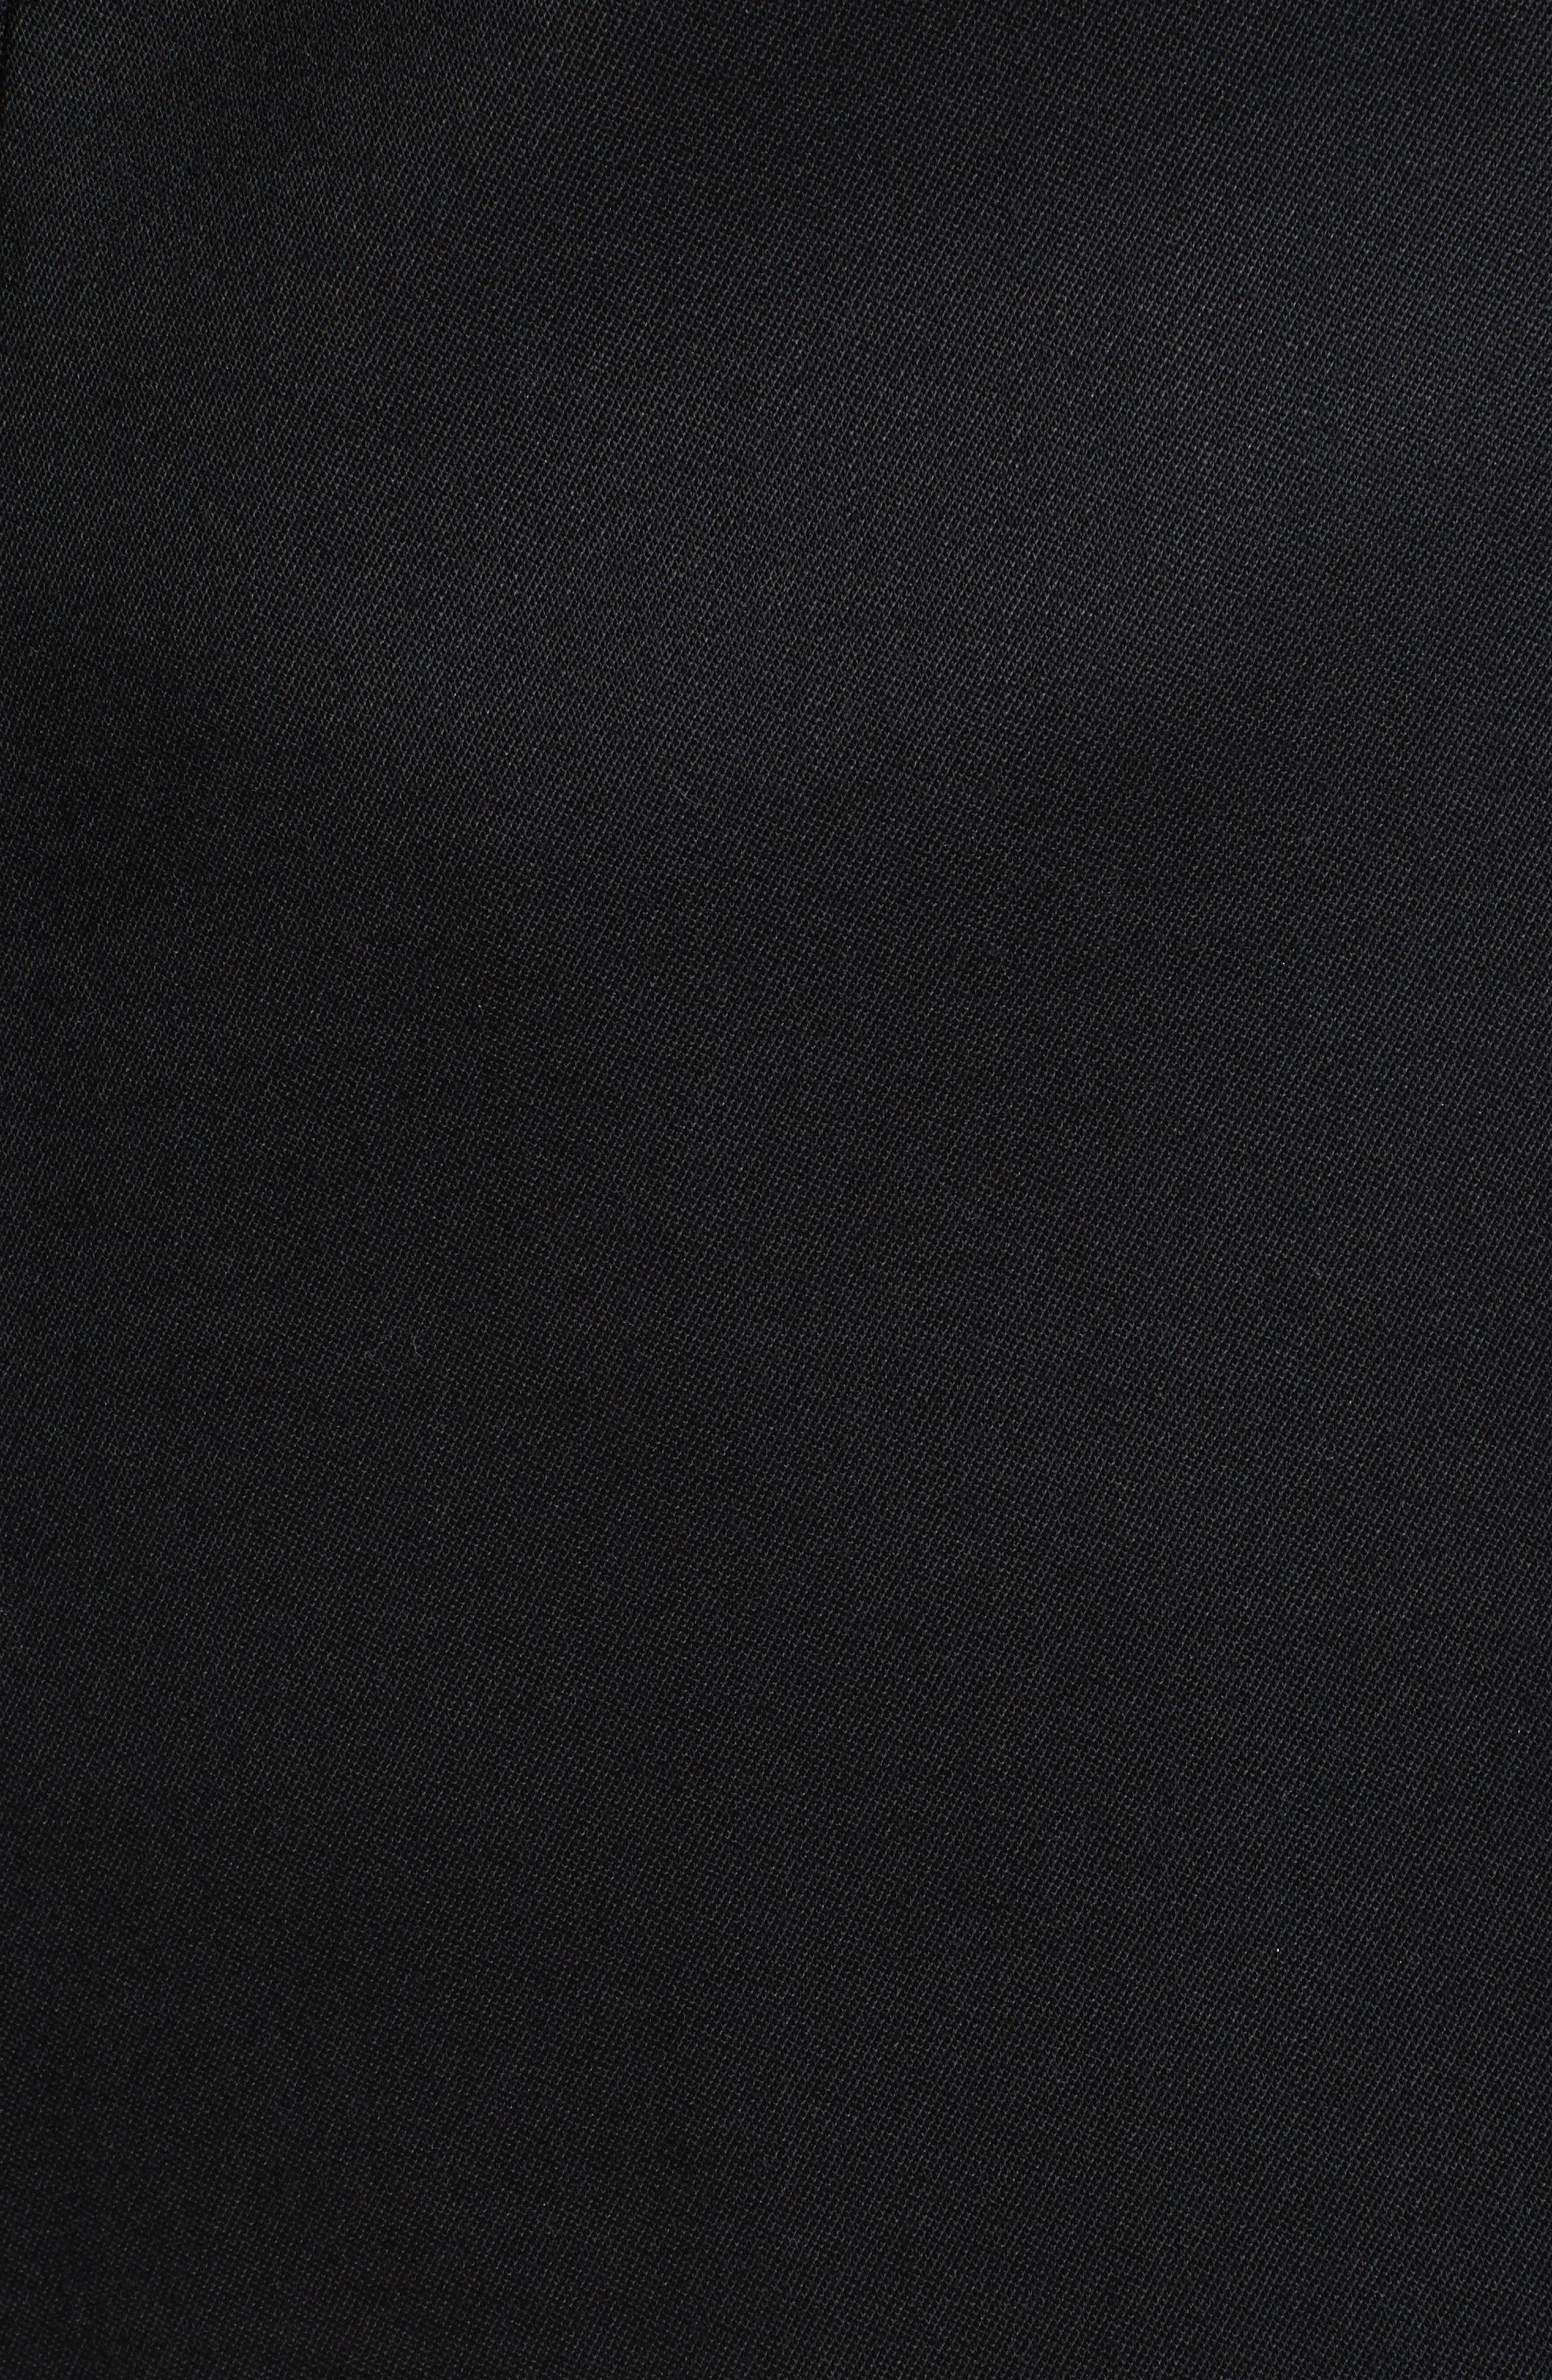 Wool Blend Tuxedo Jacket,                             Alternate thumbnail 5, color,                             001